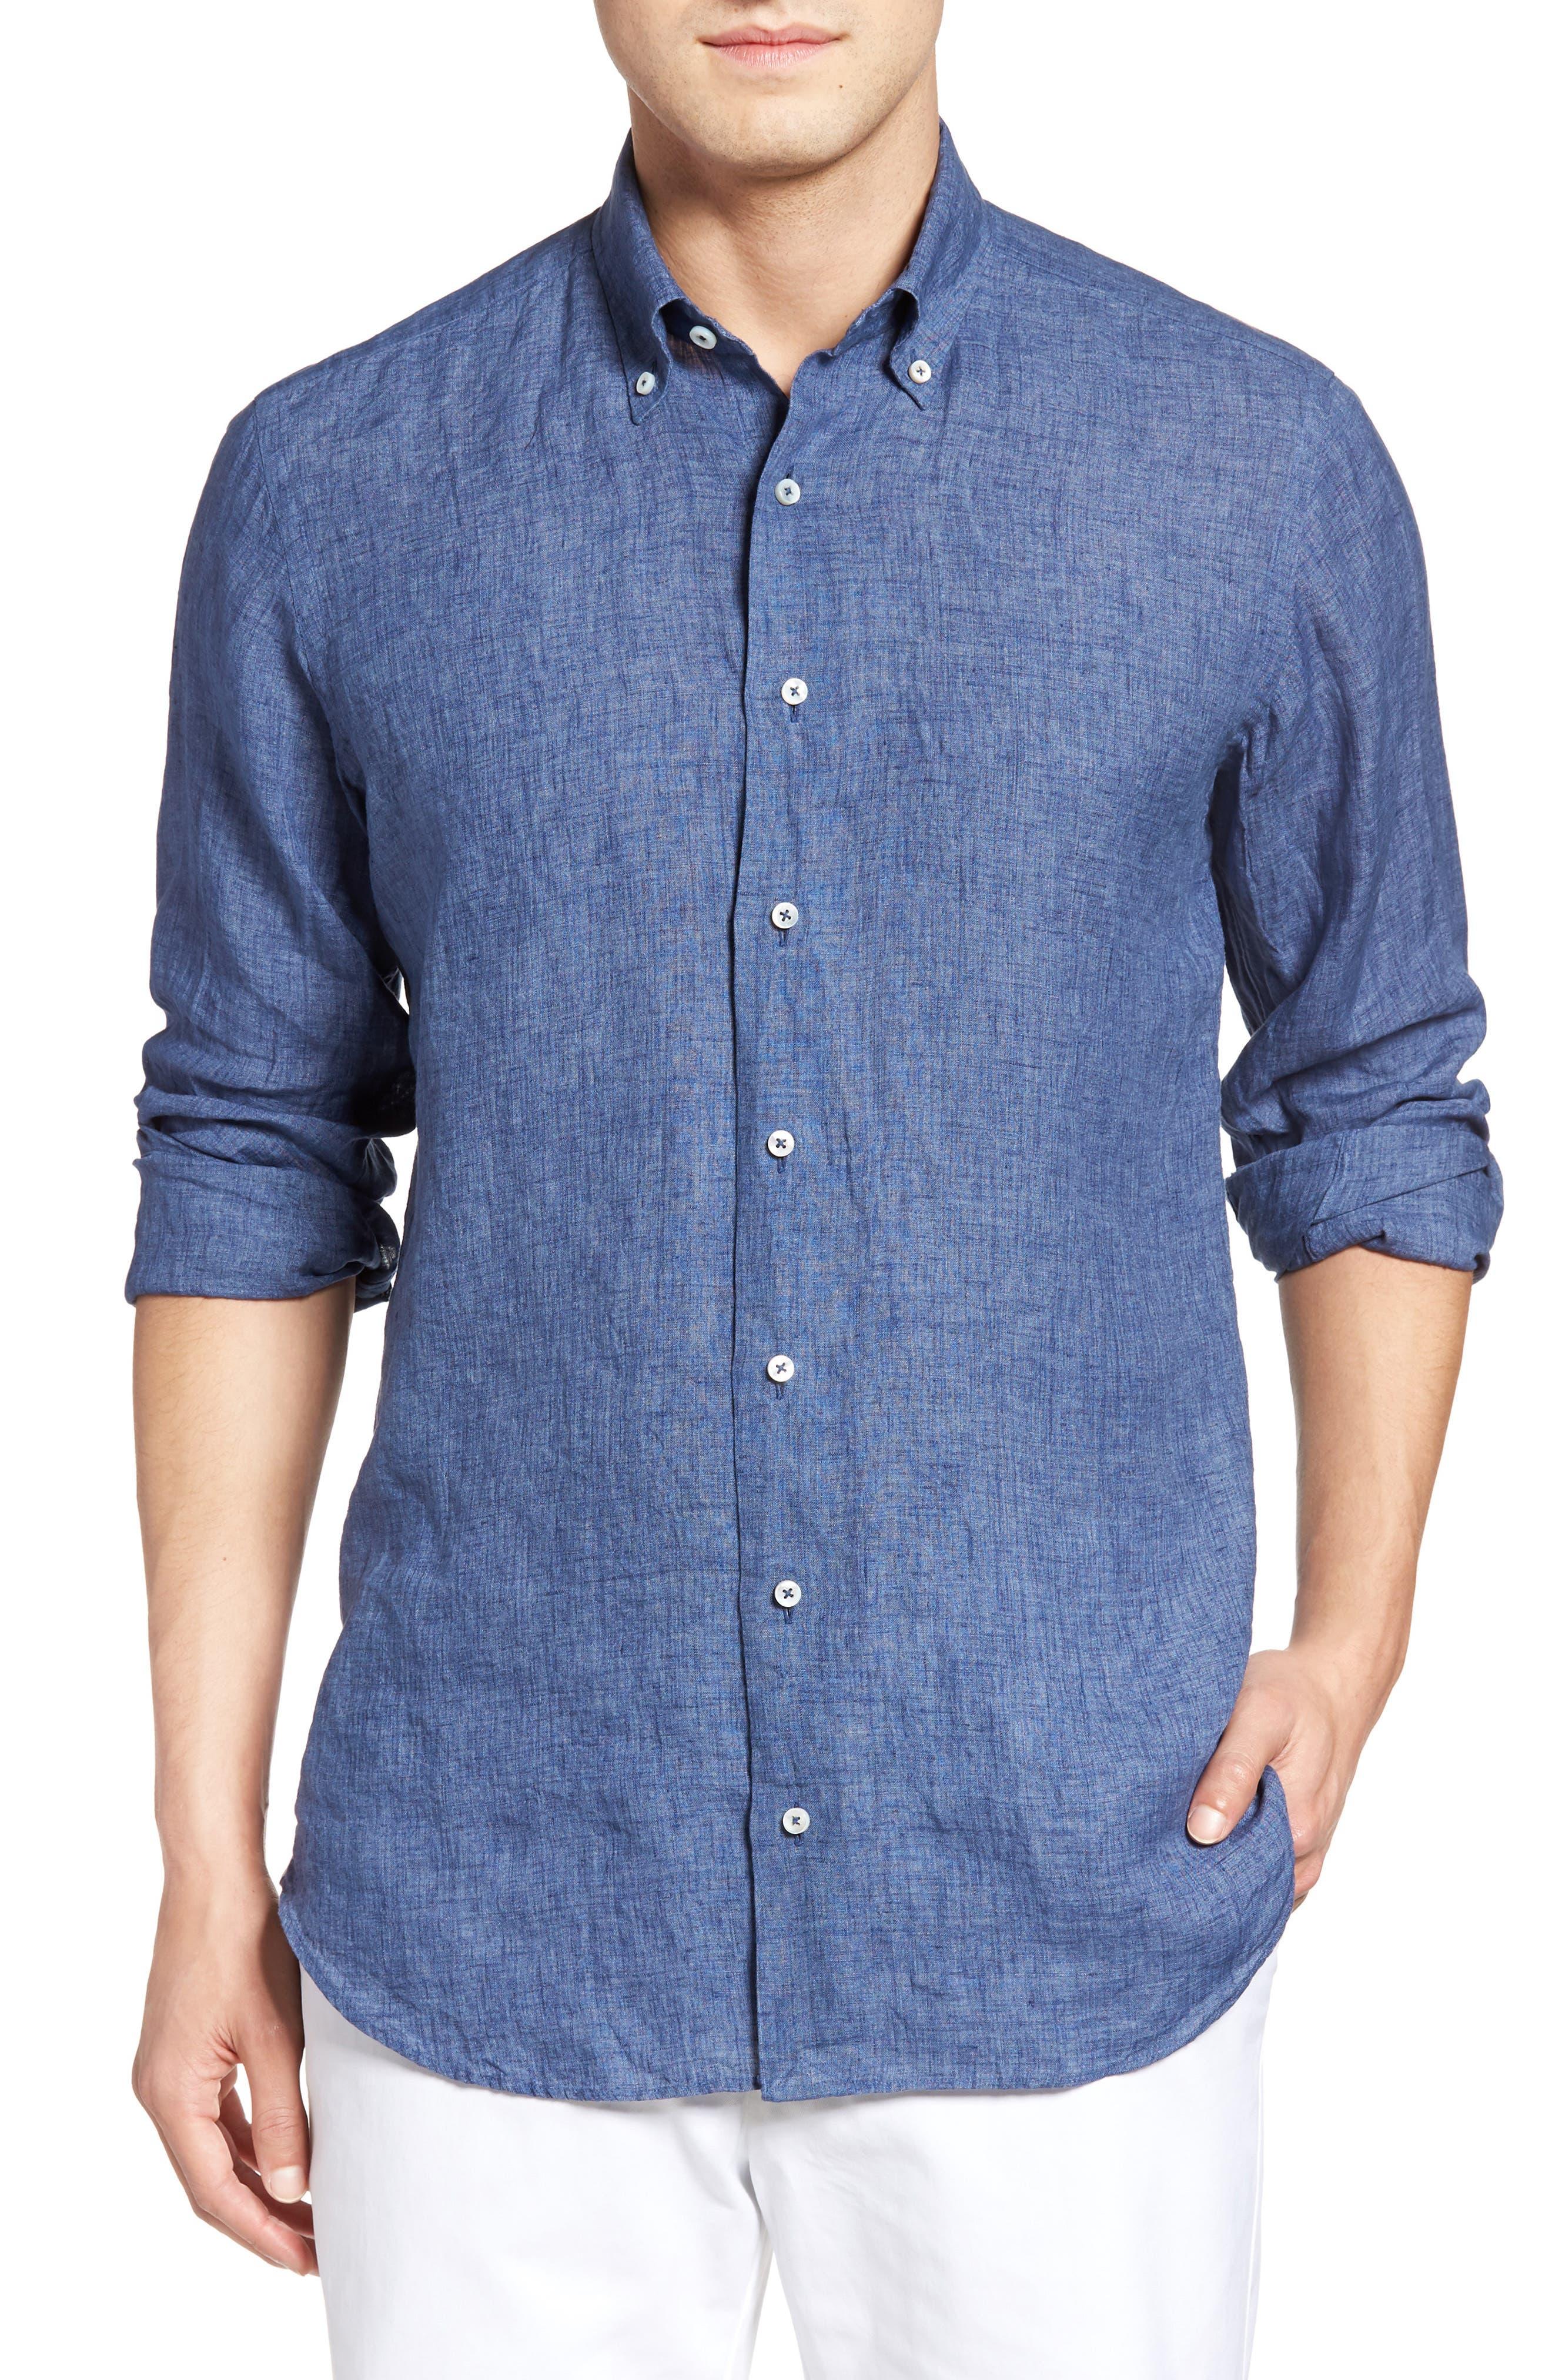 Alternate Image 1 Selected - Robert Talbott Estate Tailored Fit Sport Shirt